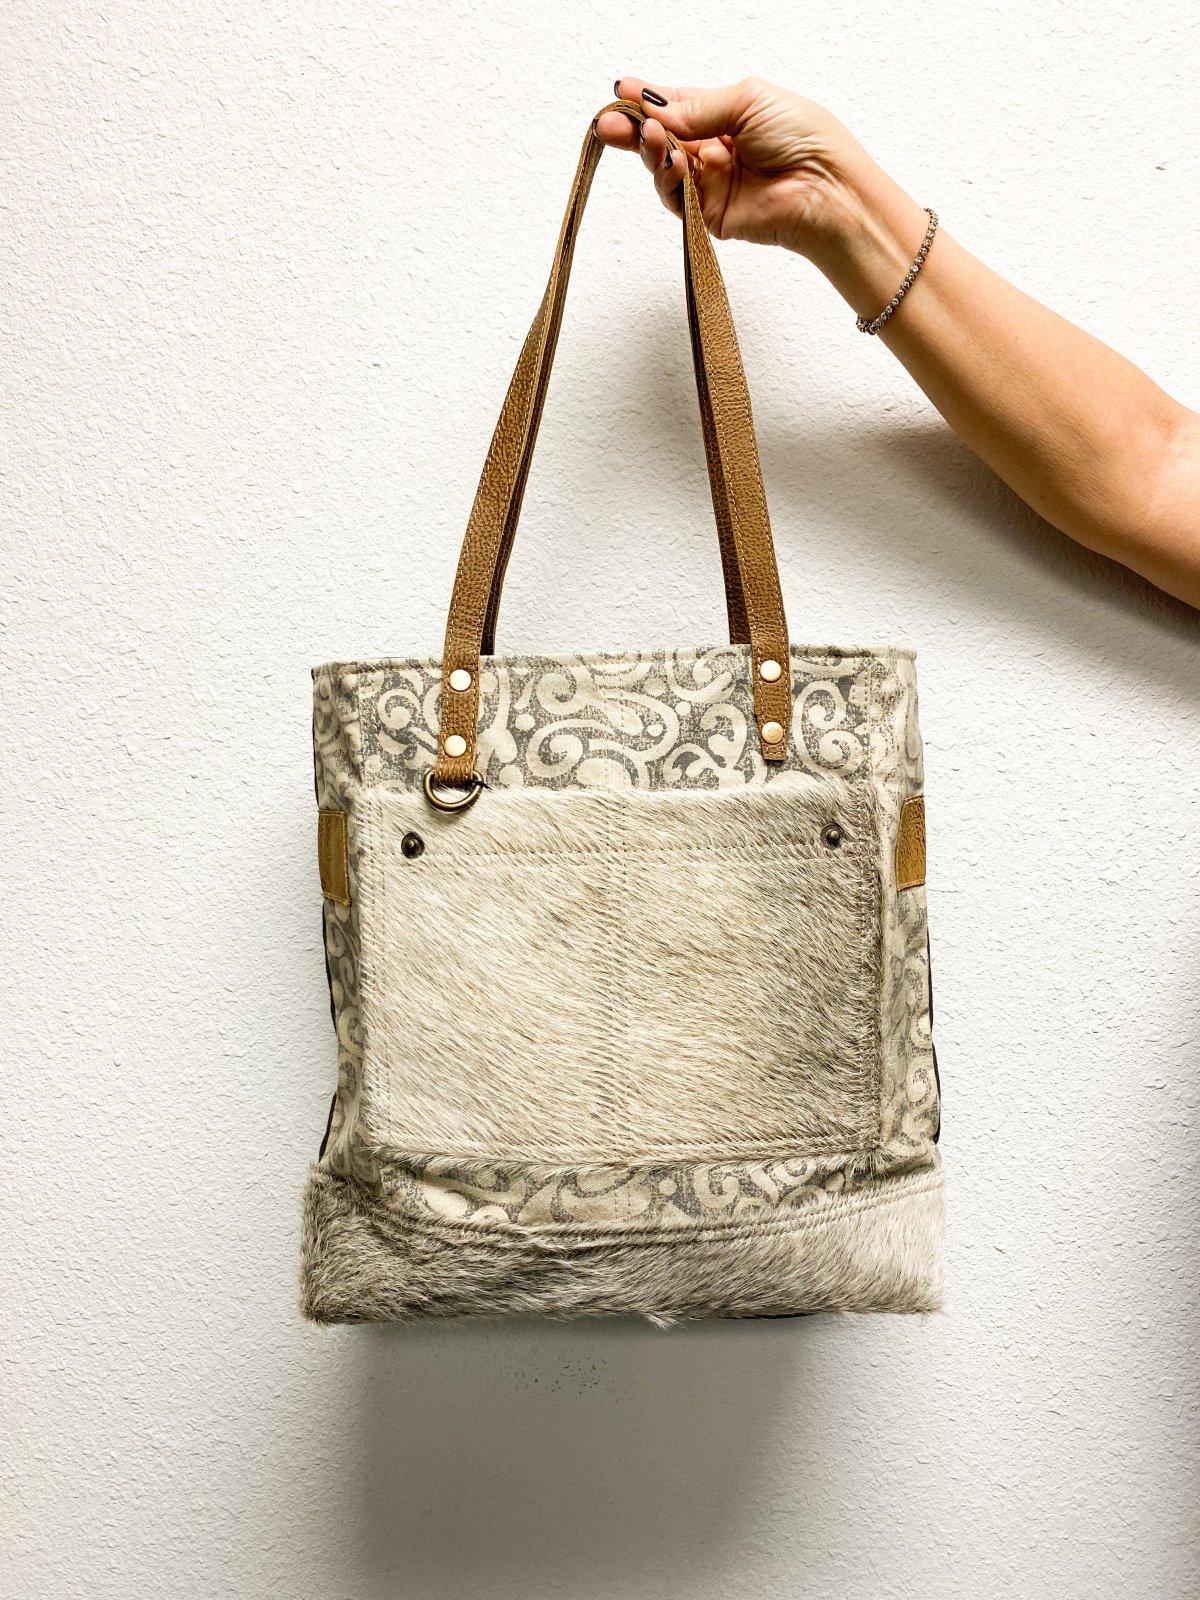 Myra Bags Myrabag gives cowhide bag, old military tarp and tent bag, unique and fashionably chic bag. myra bags